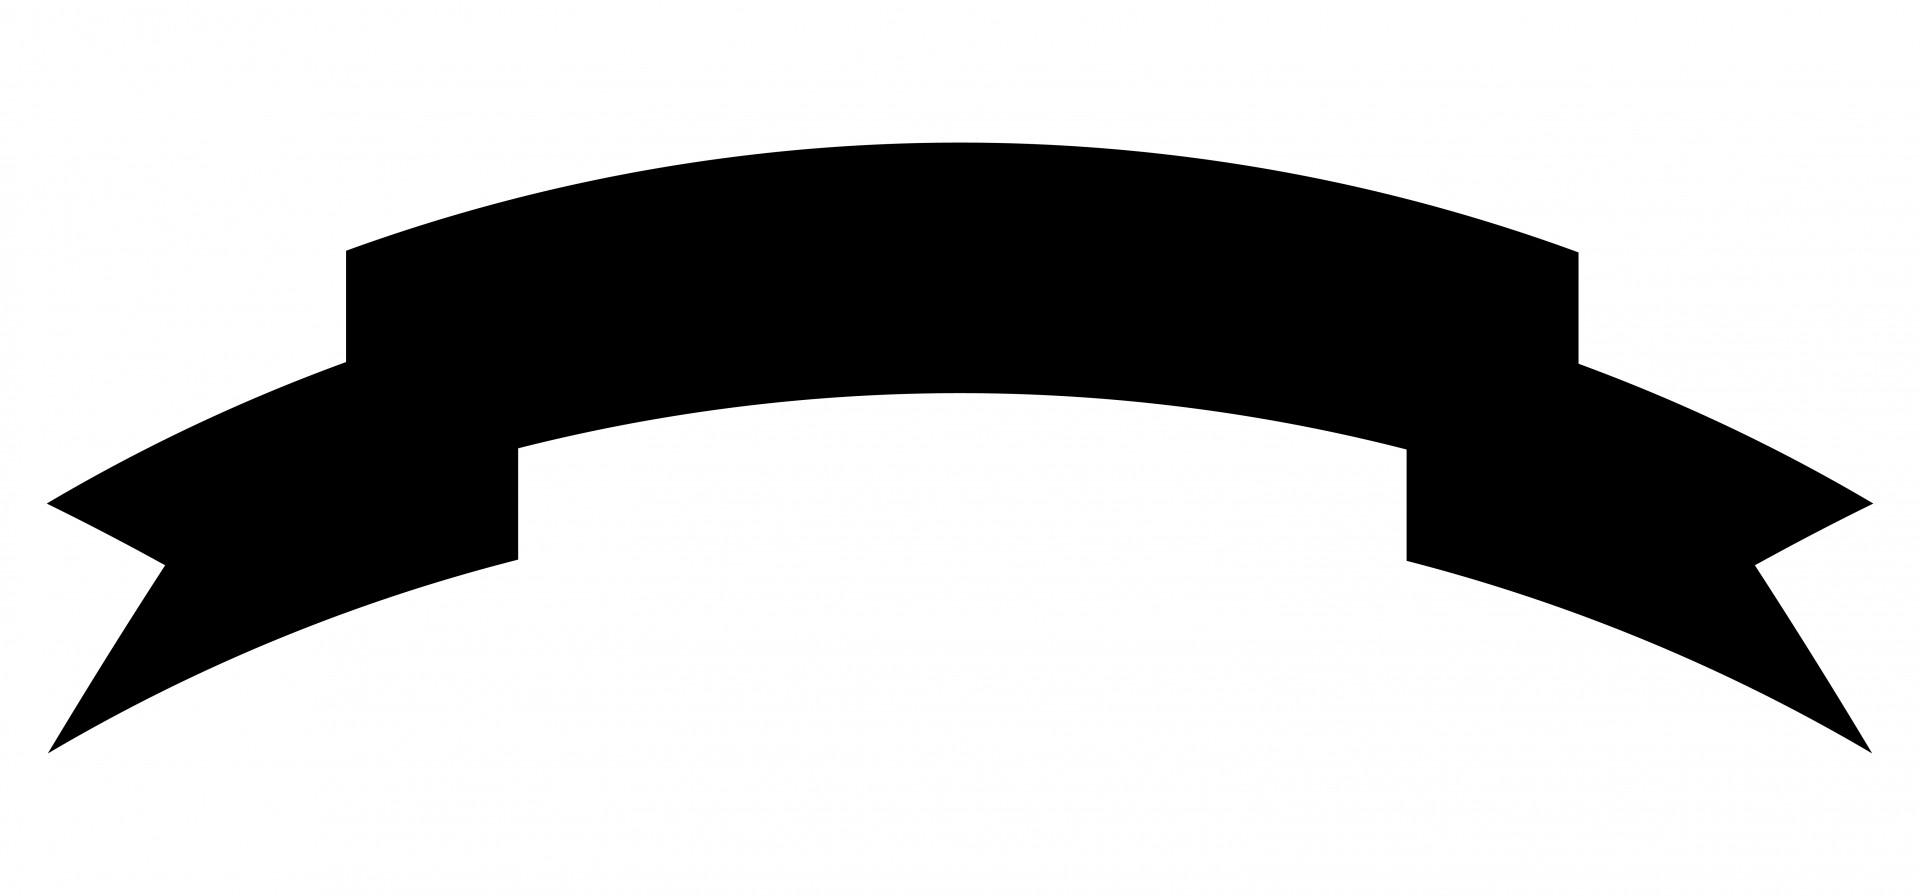 1920x896 Banner Black Silhouette Free Stock Photo